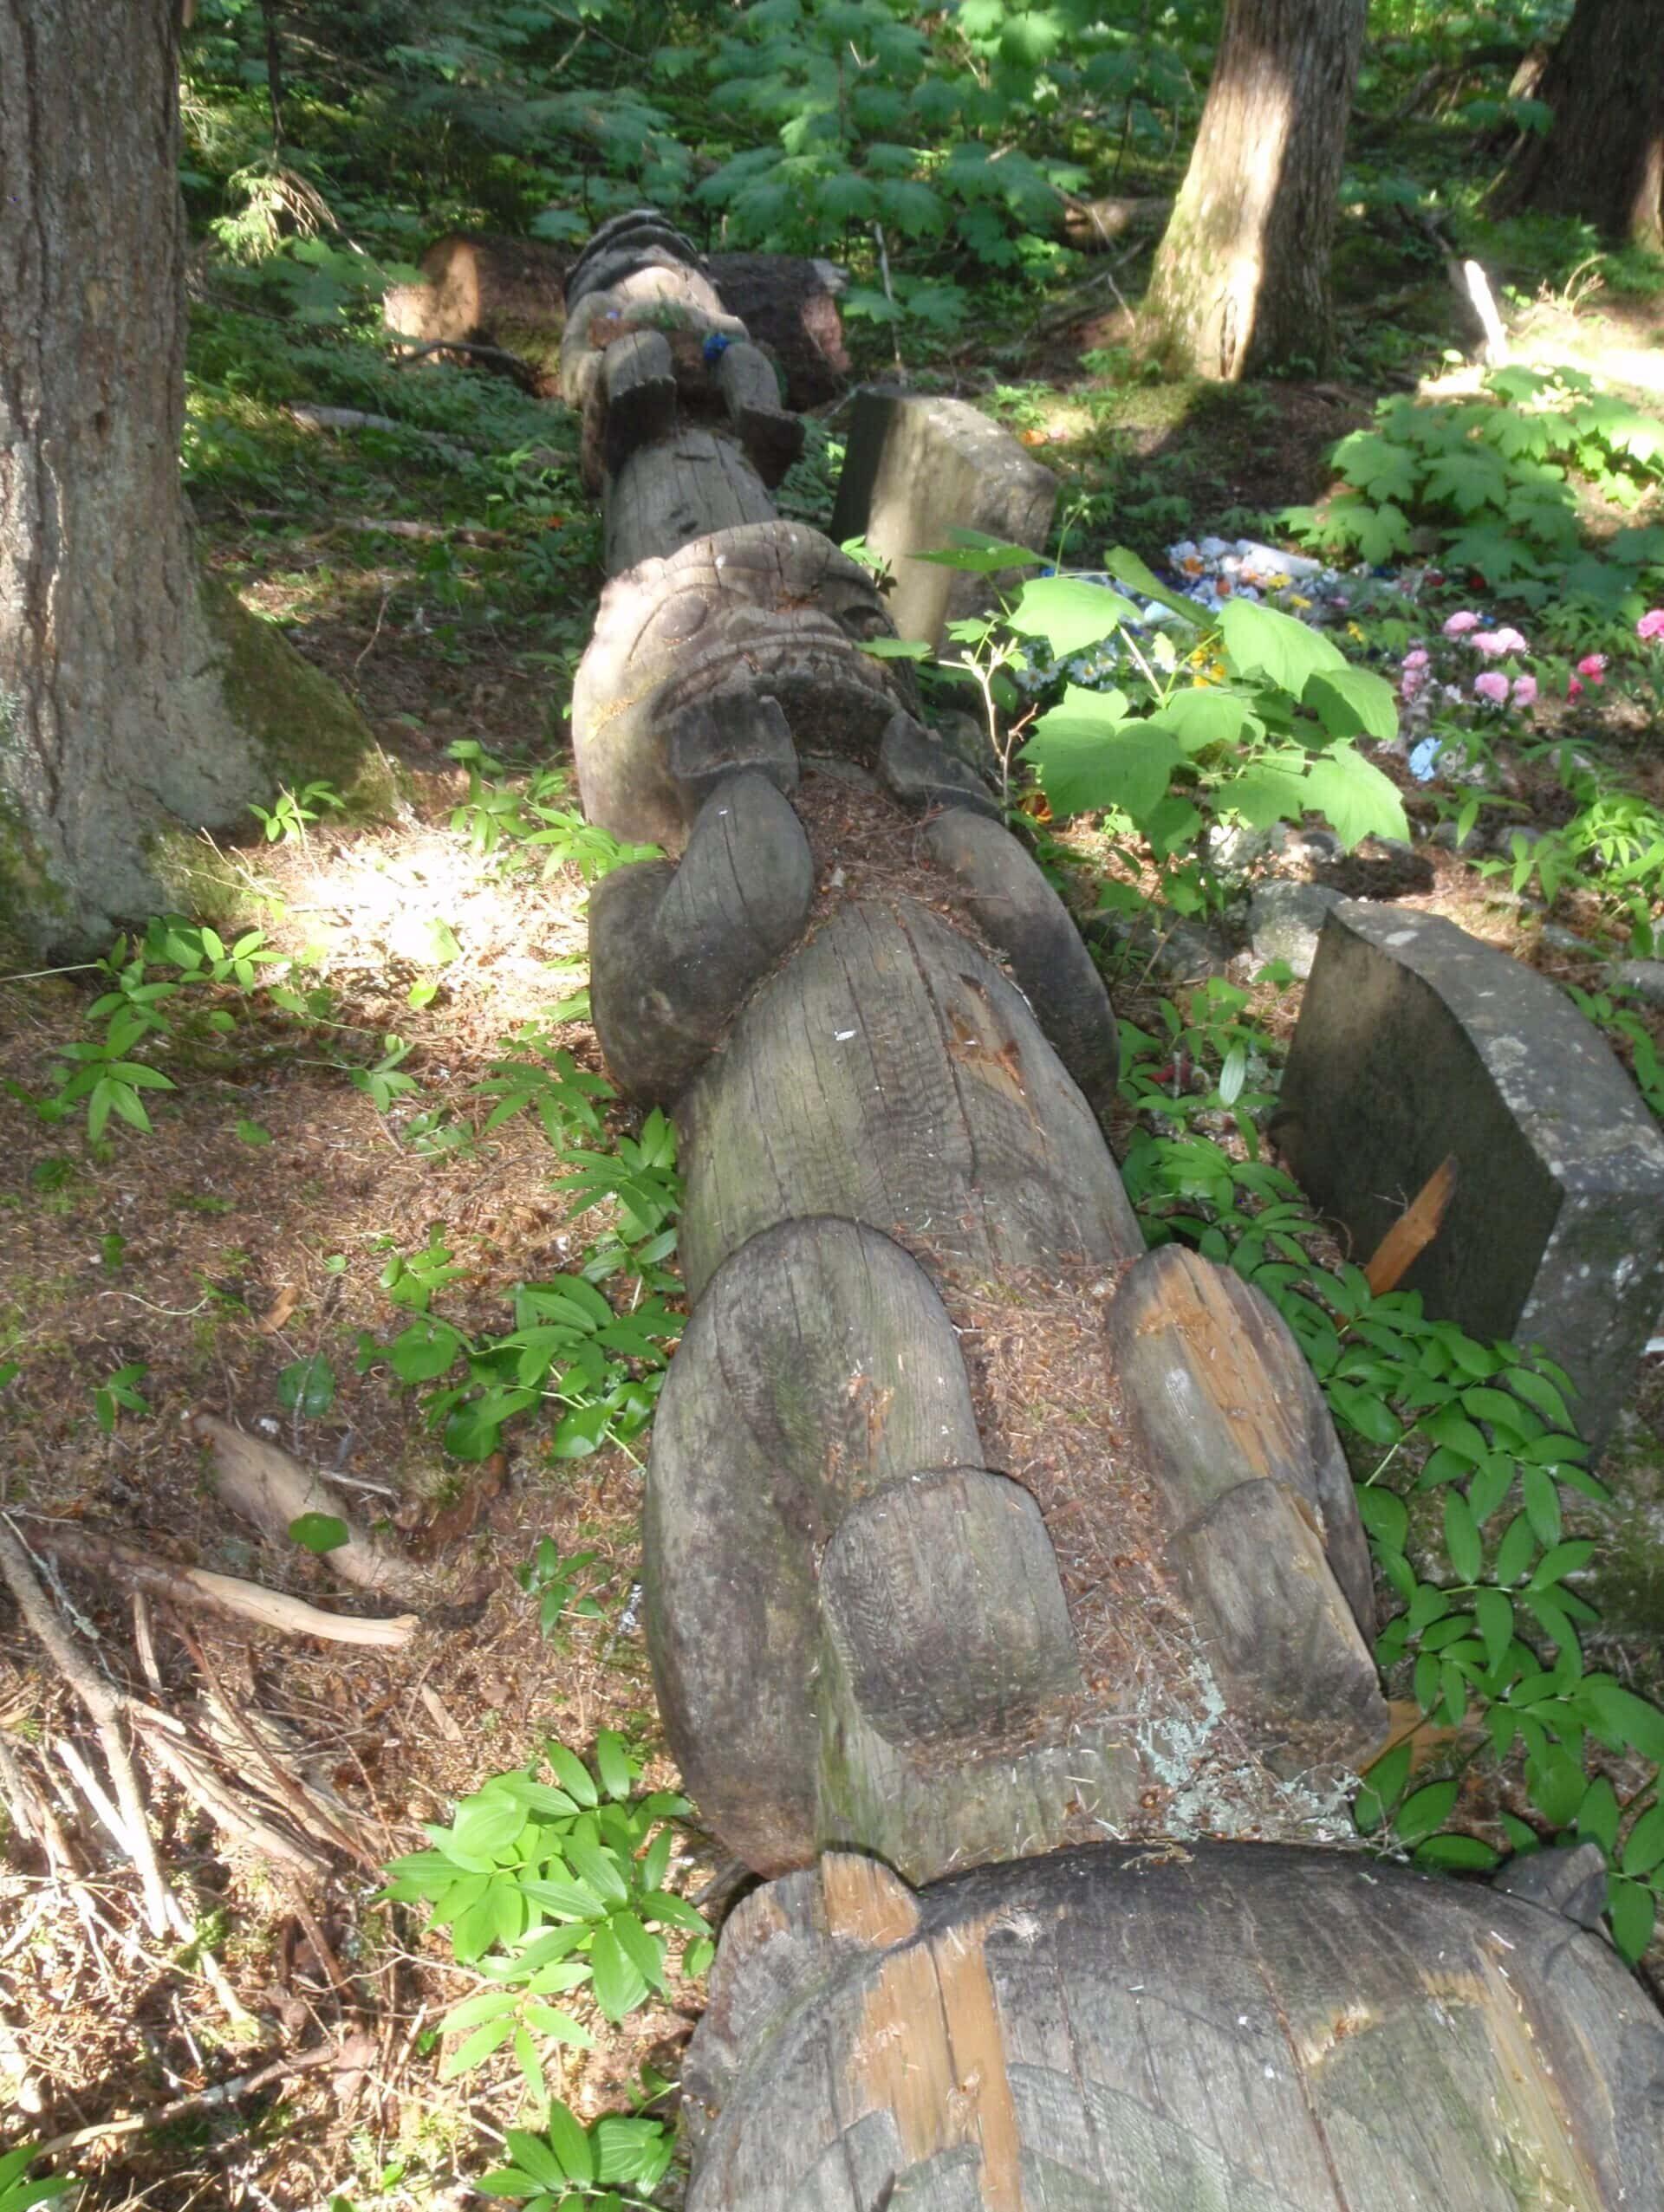 G'psgolox totem pole lying on the ground among trees